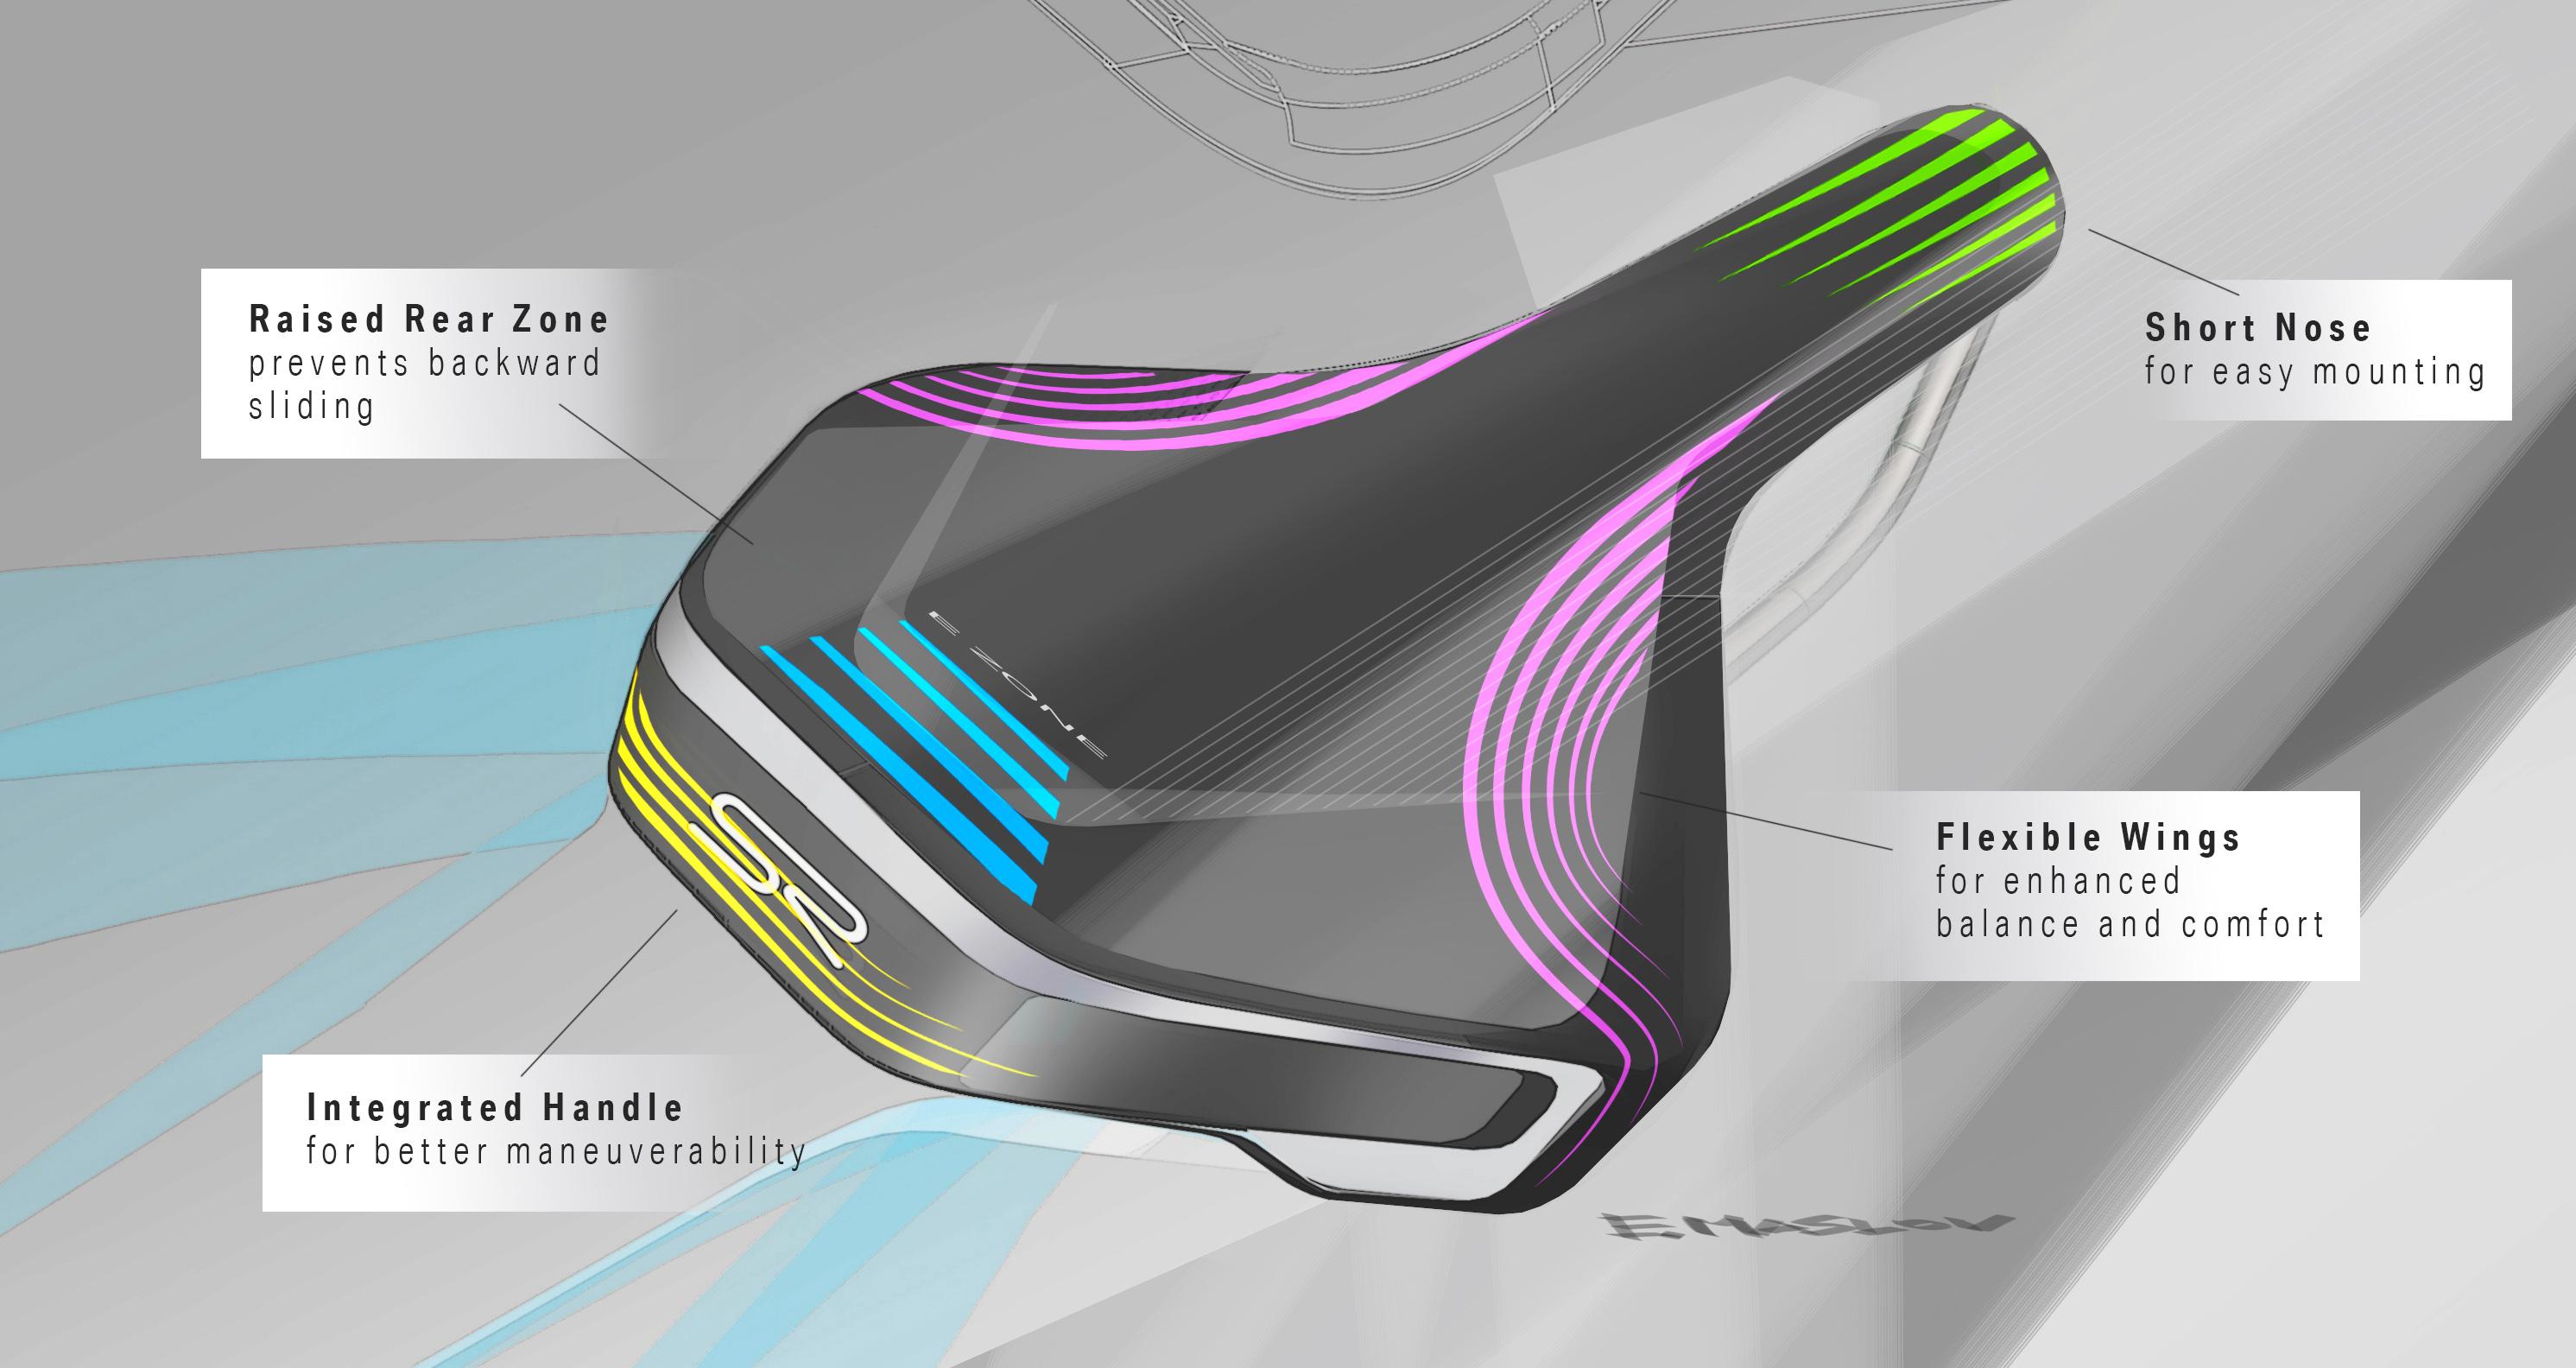 Cardesign.ru - The main resource about transport design. Design of auto. Portfolio. Photo gallery. Projects. Design Forum.